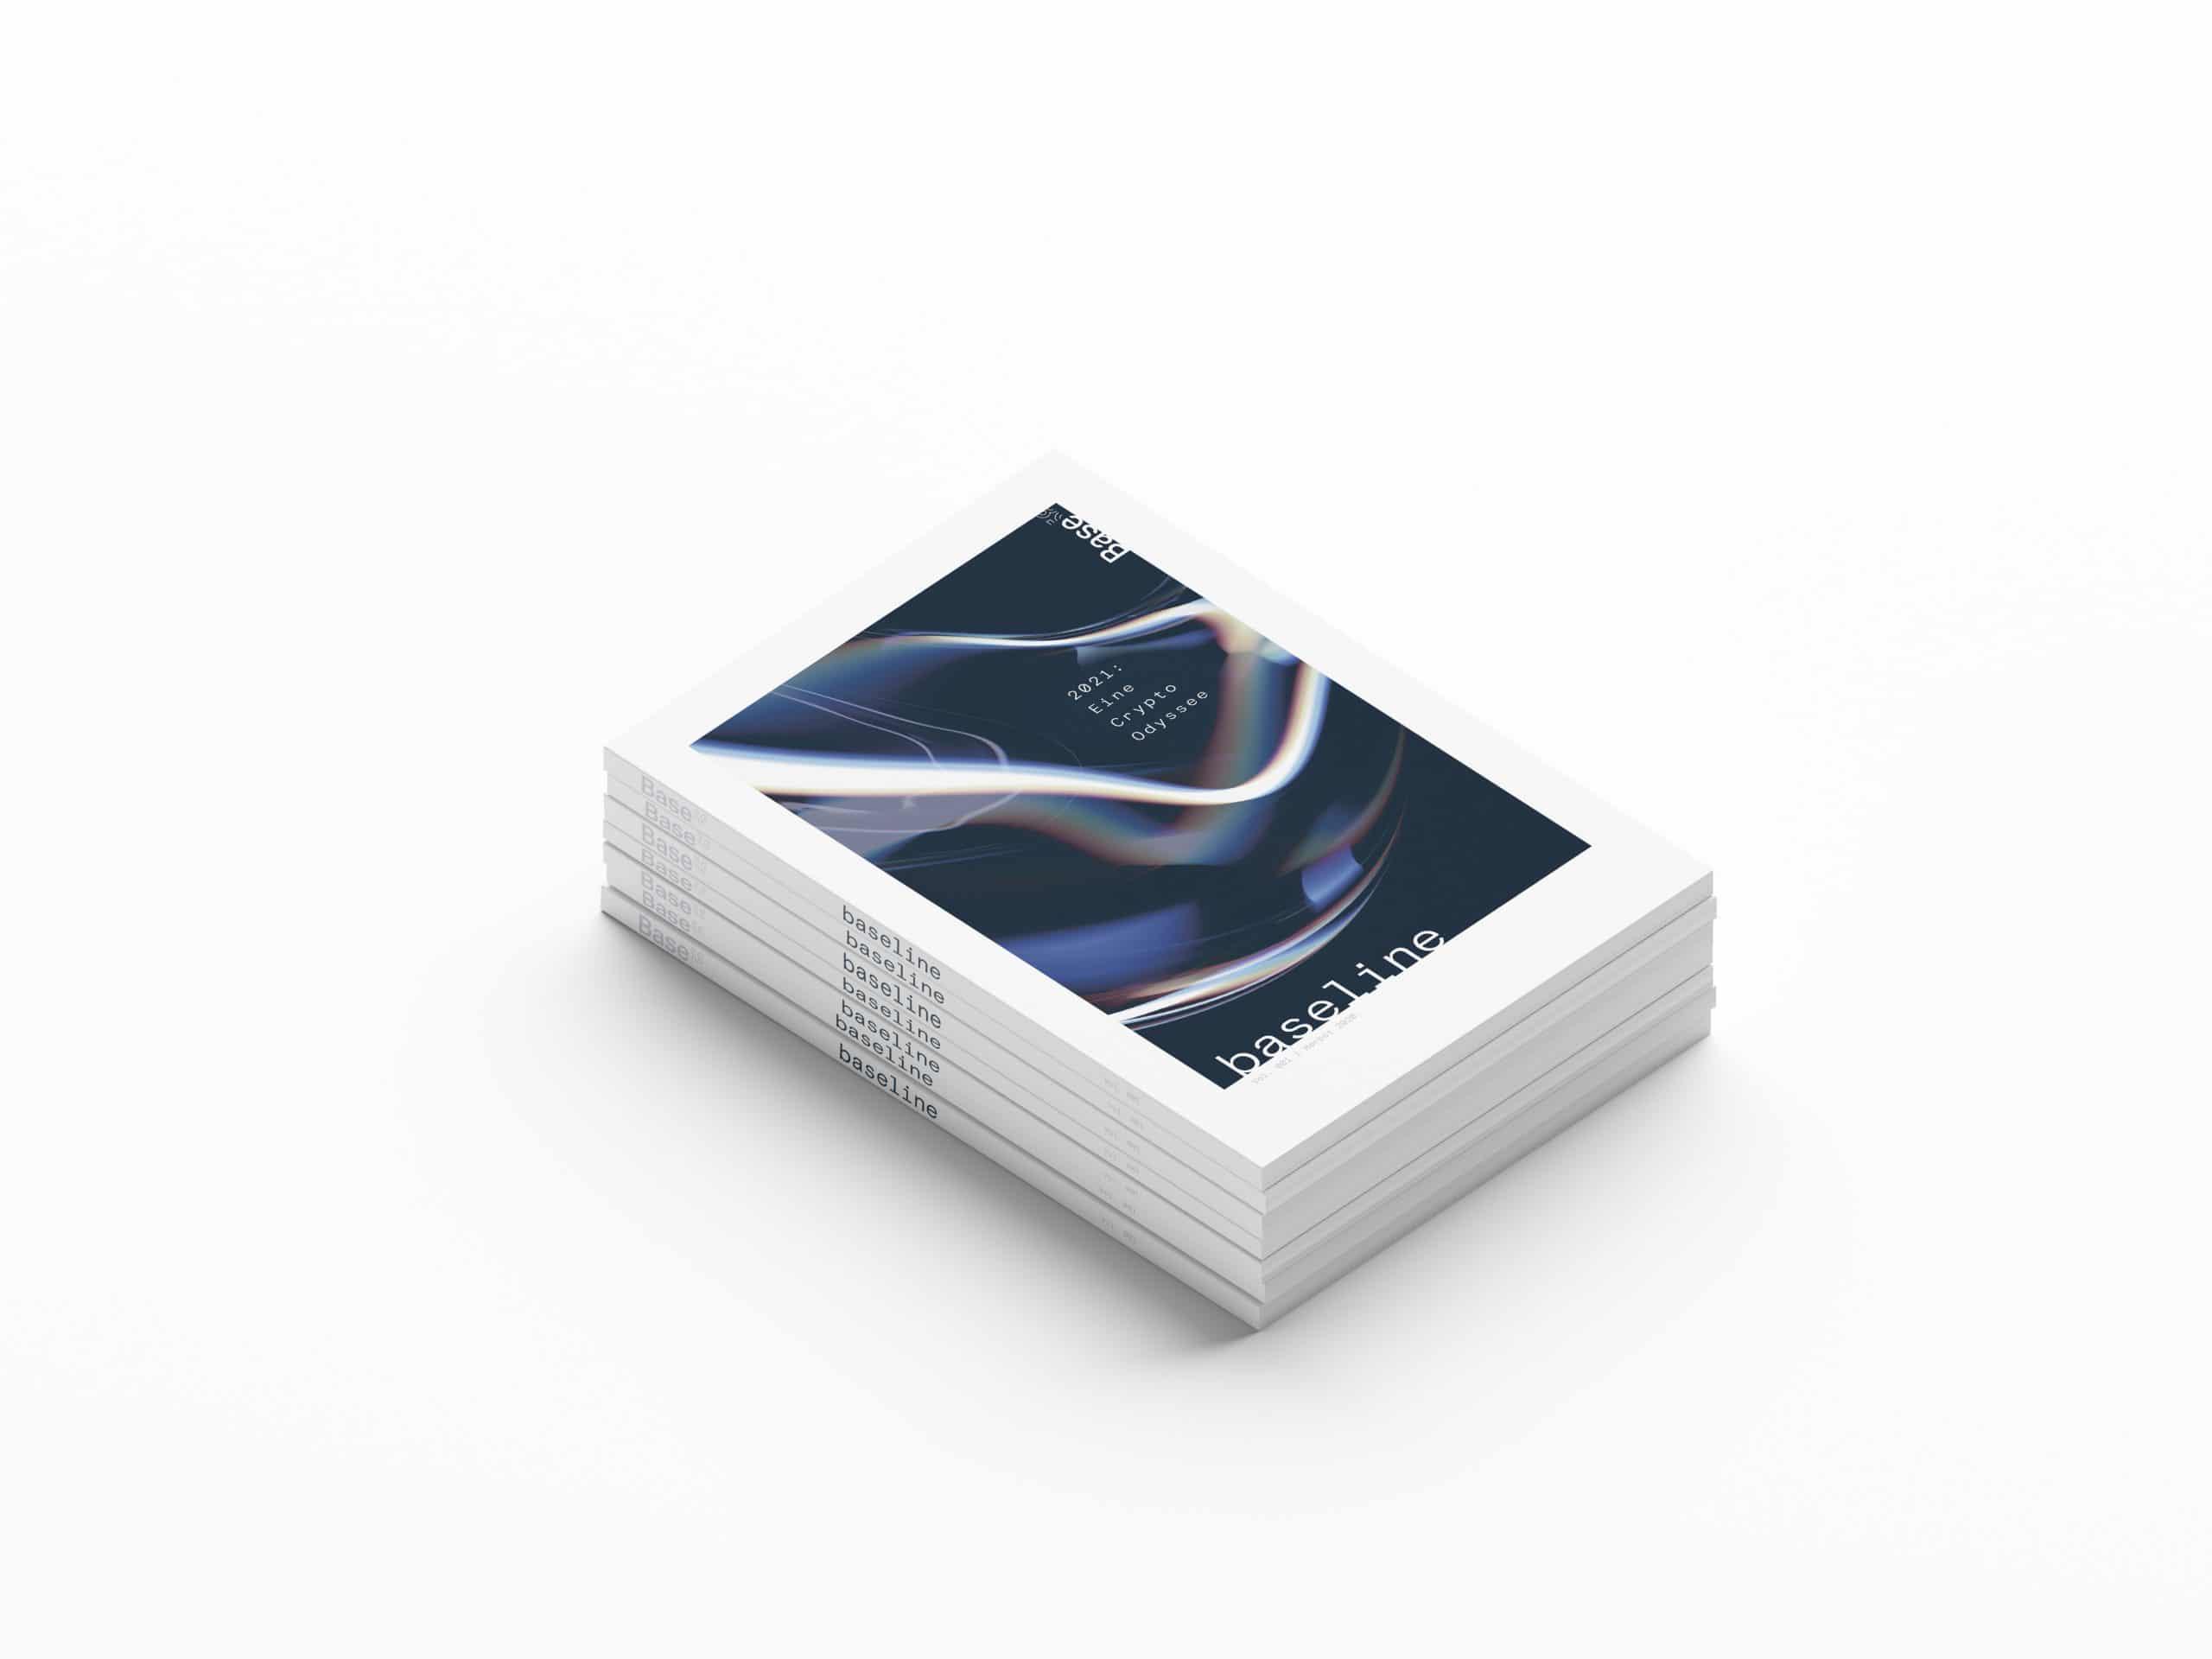 mimosa - brand consultancy - digital marketing agency - creative studio - Product design - Logo